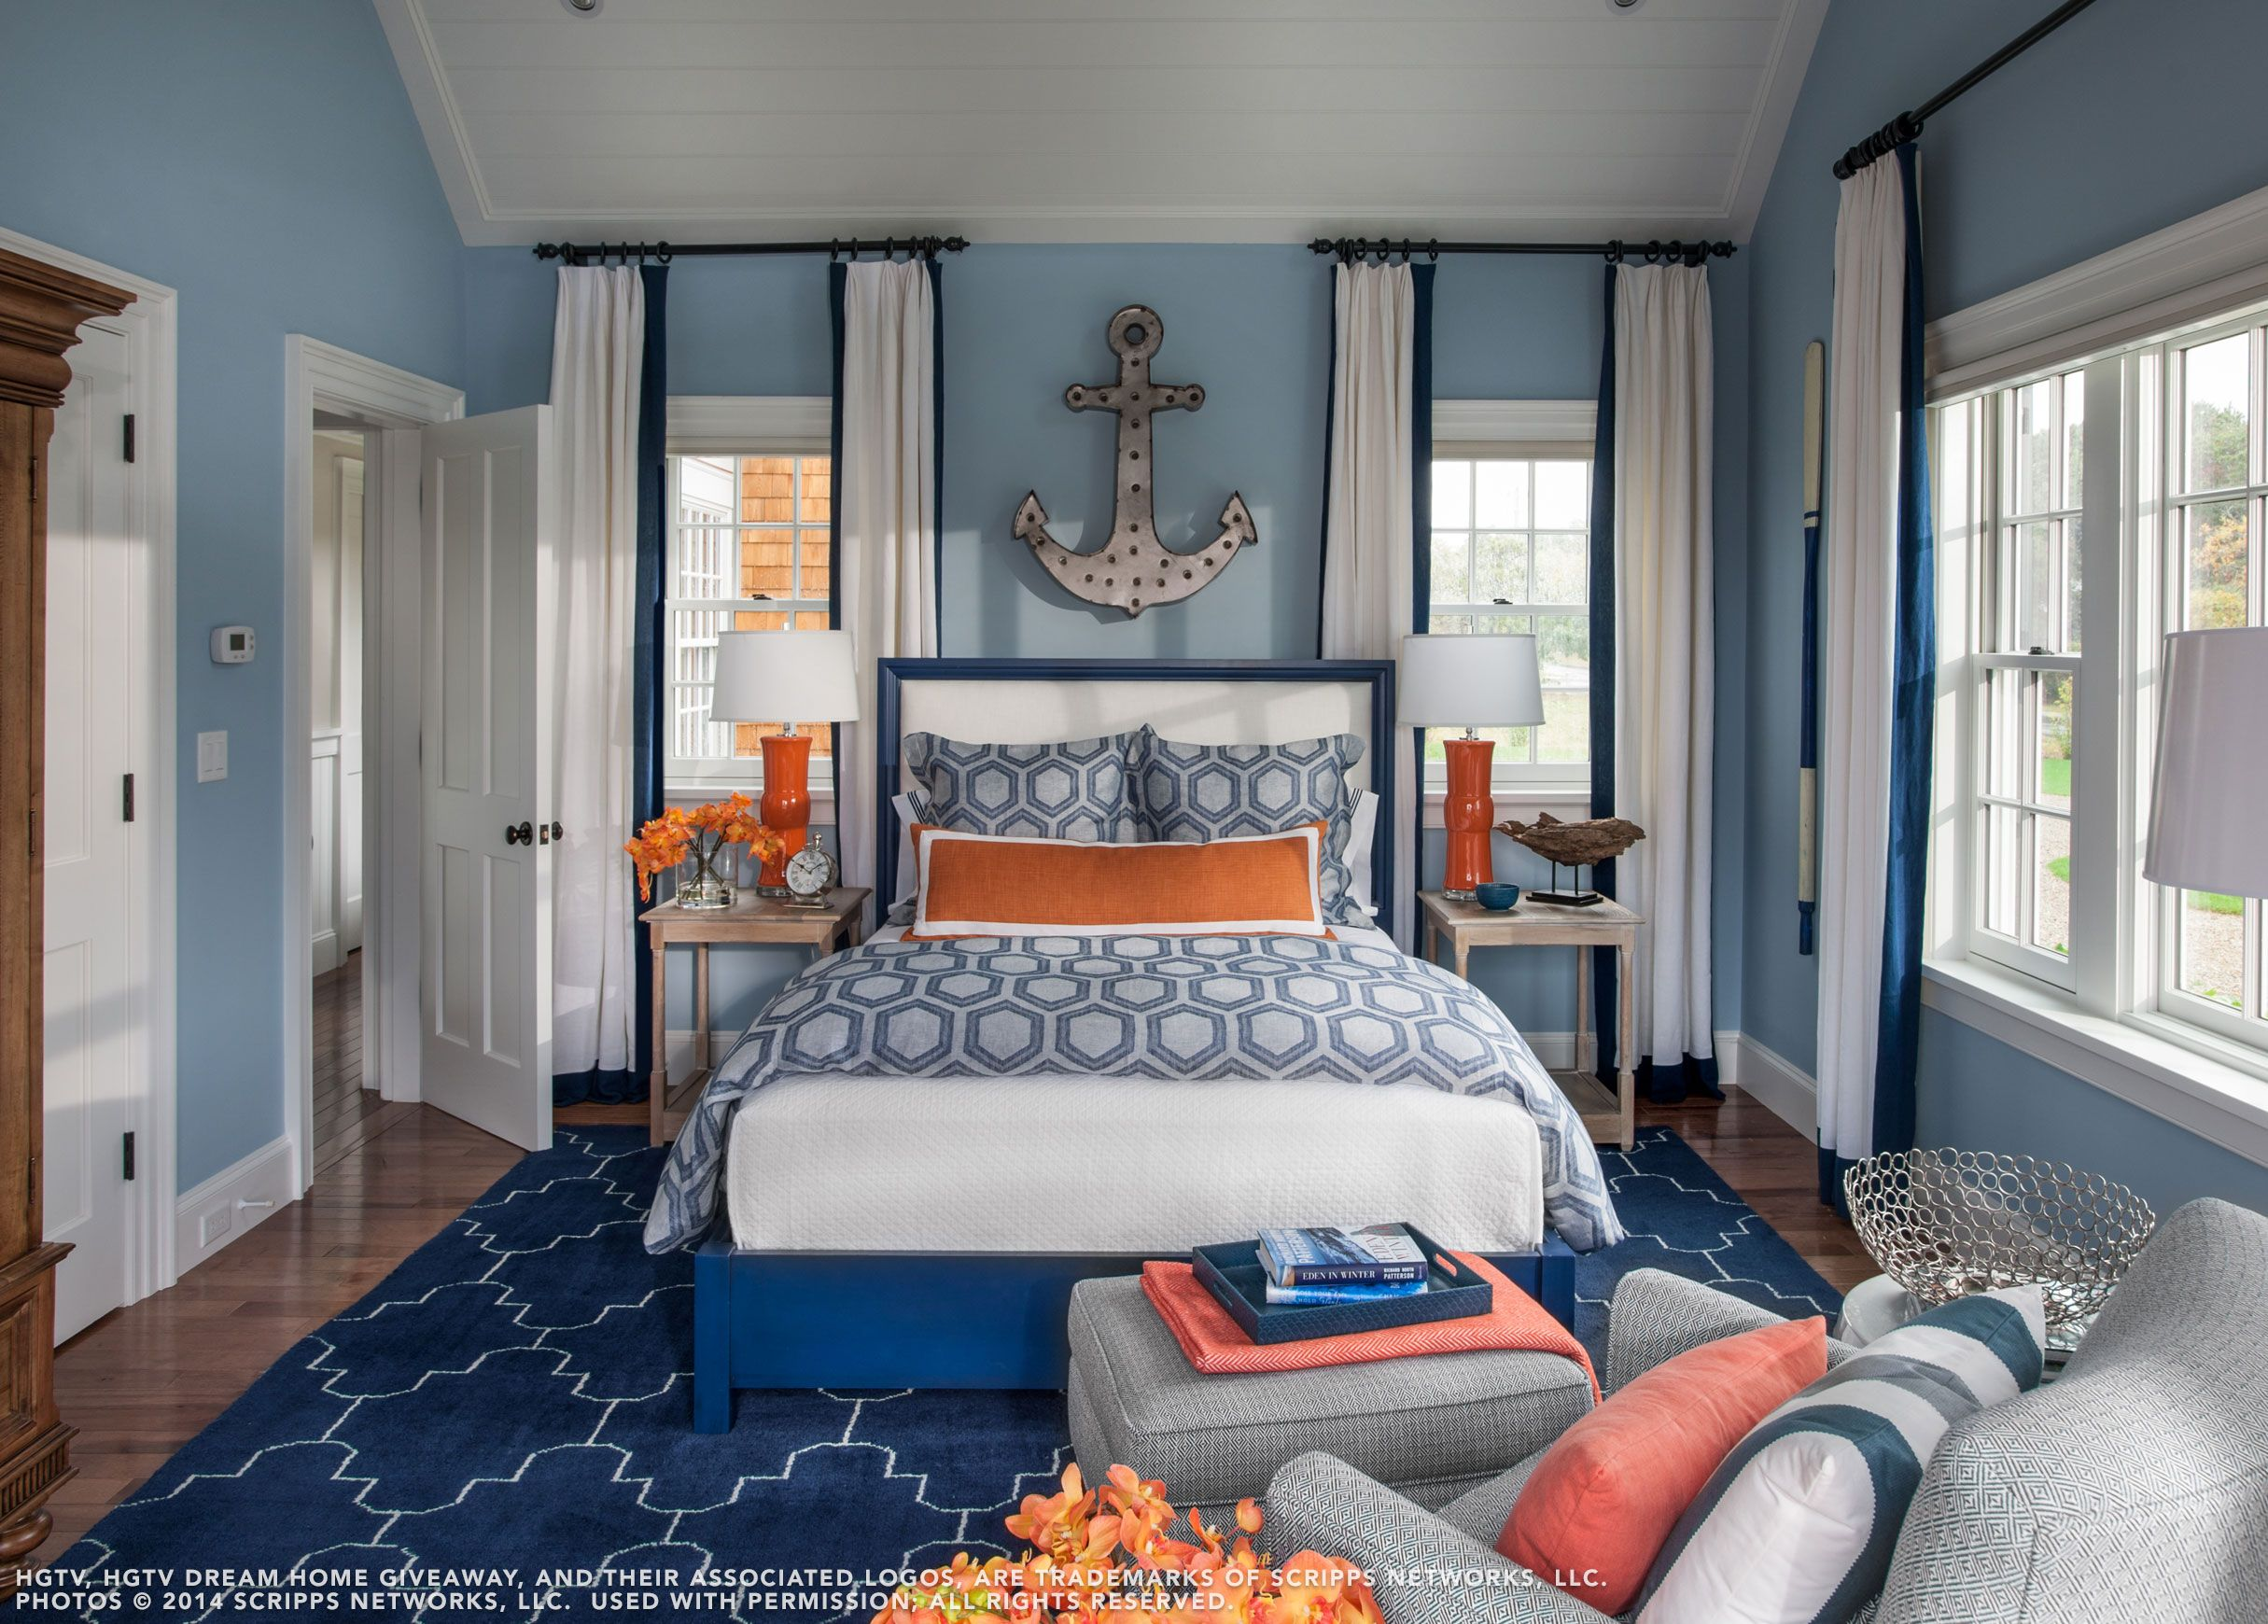 mandy from decor inspiration bedroom jesse guest tyler l isabel moore digest story emily ferguson p architectural nautical ratajkowski